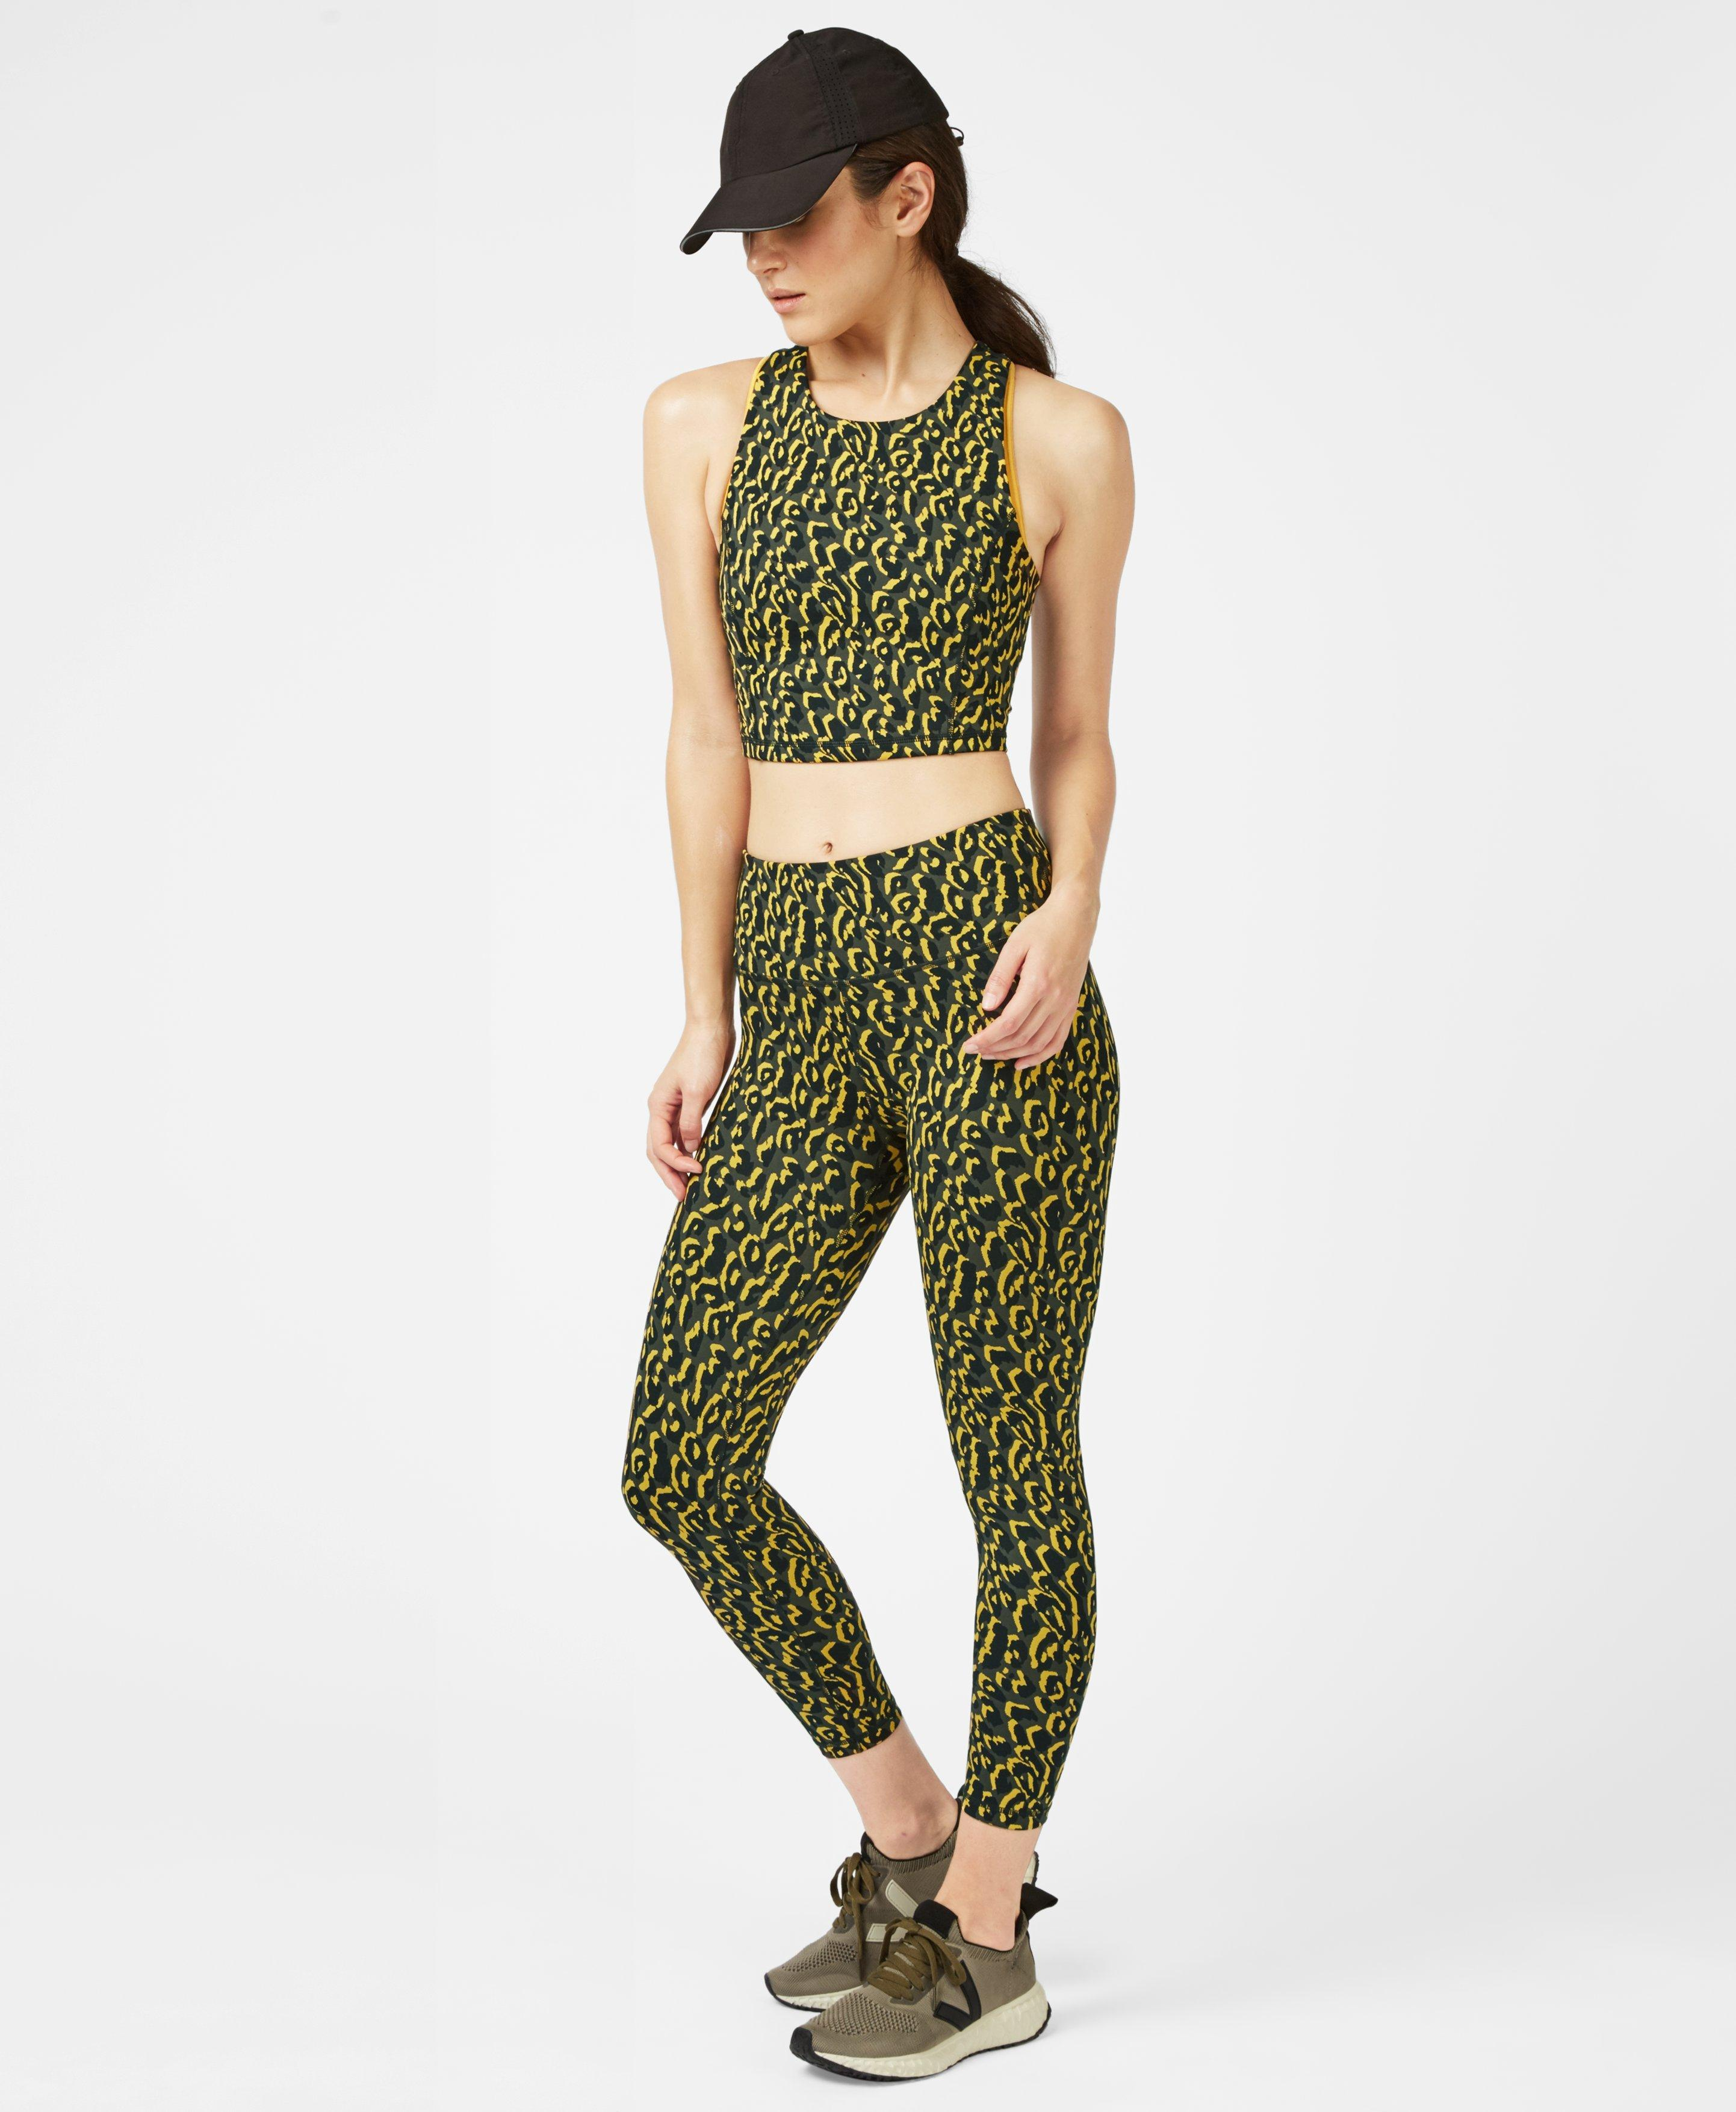 Jacquard Turmeric Yellow Leopard Print Set,  | Sweaty Betty